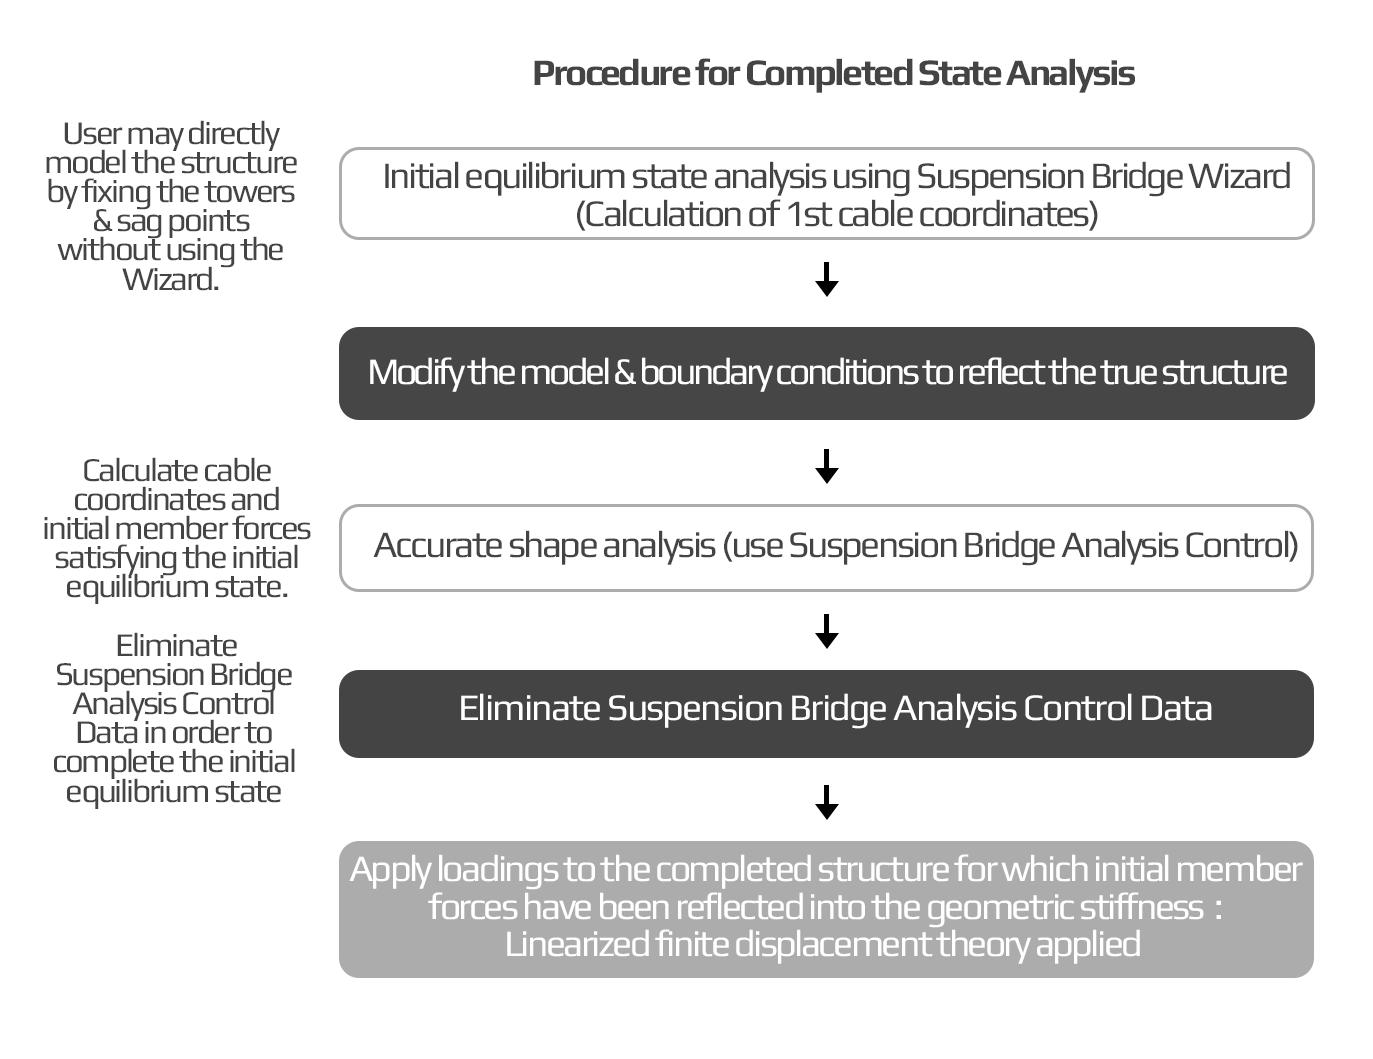 Staged Analysis for Suspension Bridges